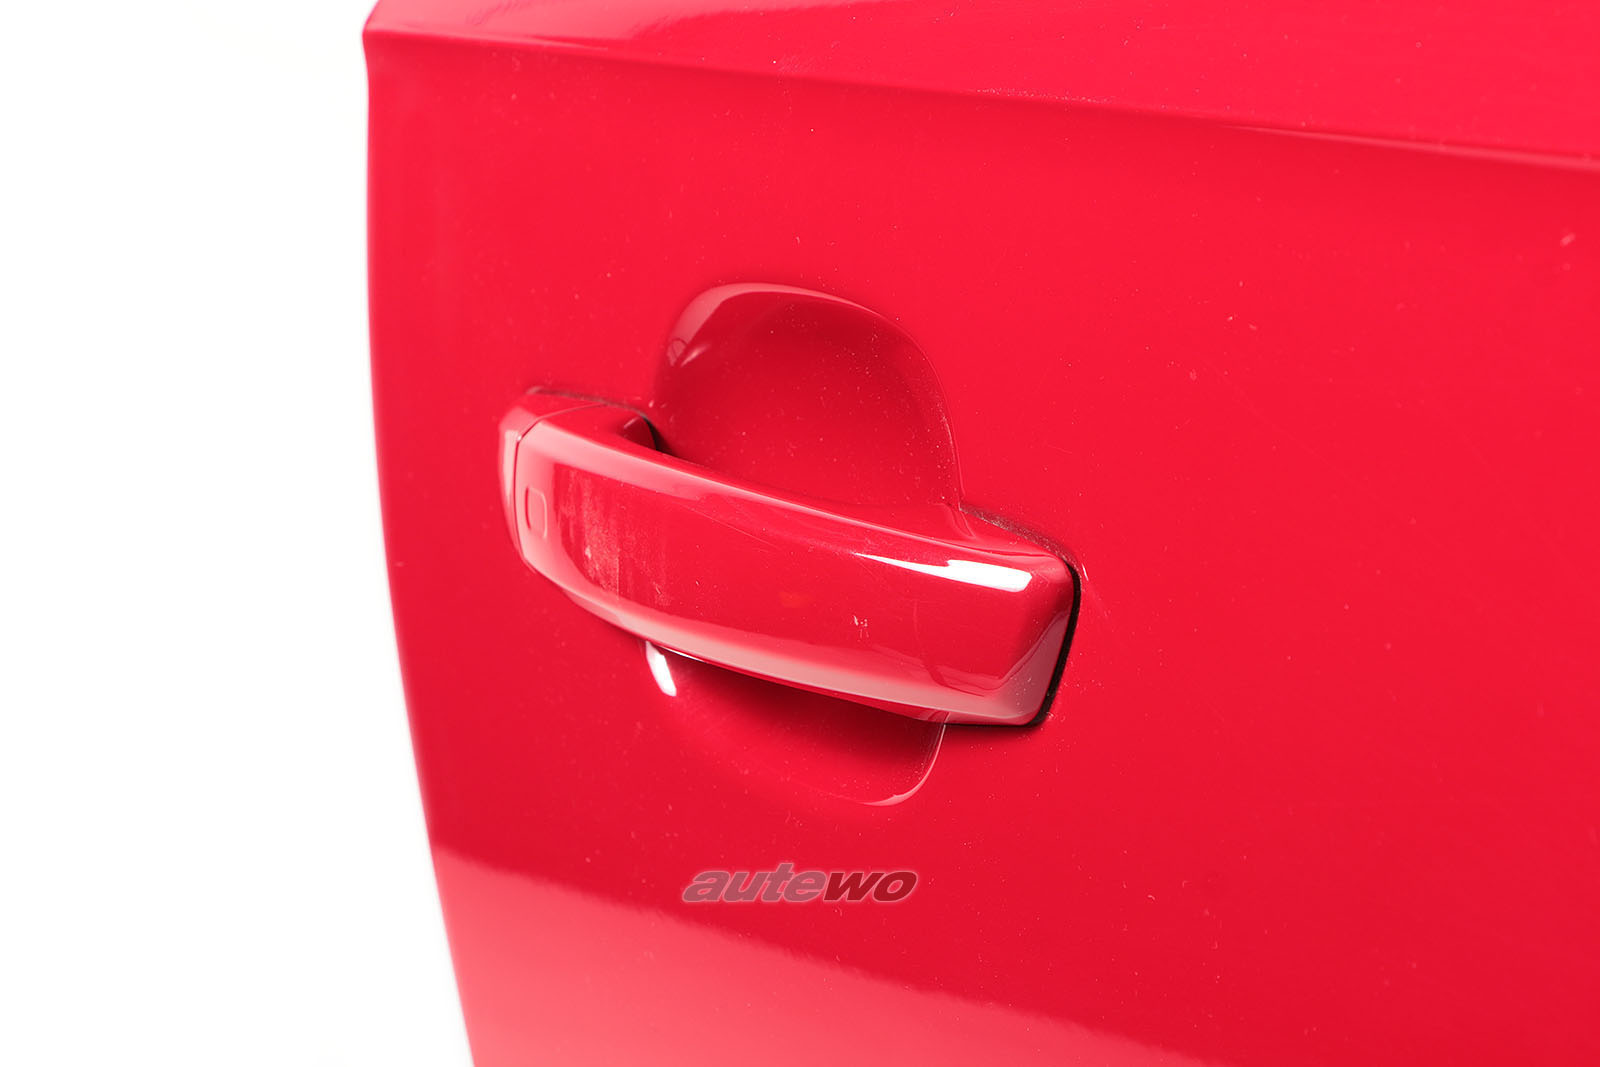 8S0831052 Audi TT/TTS 8S Tür vorne rechts LY3U Tangorot-metallic